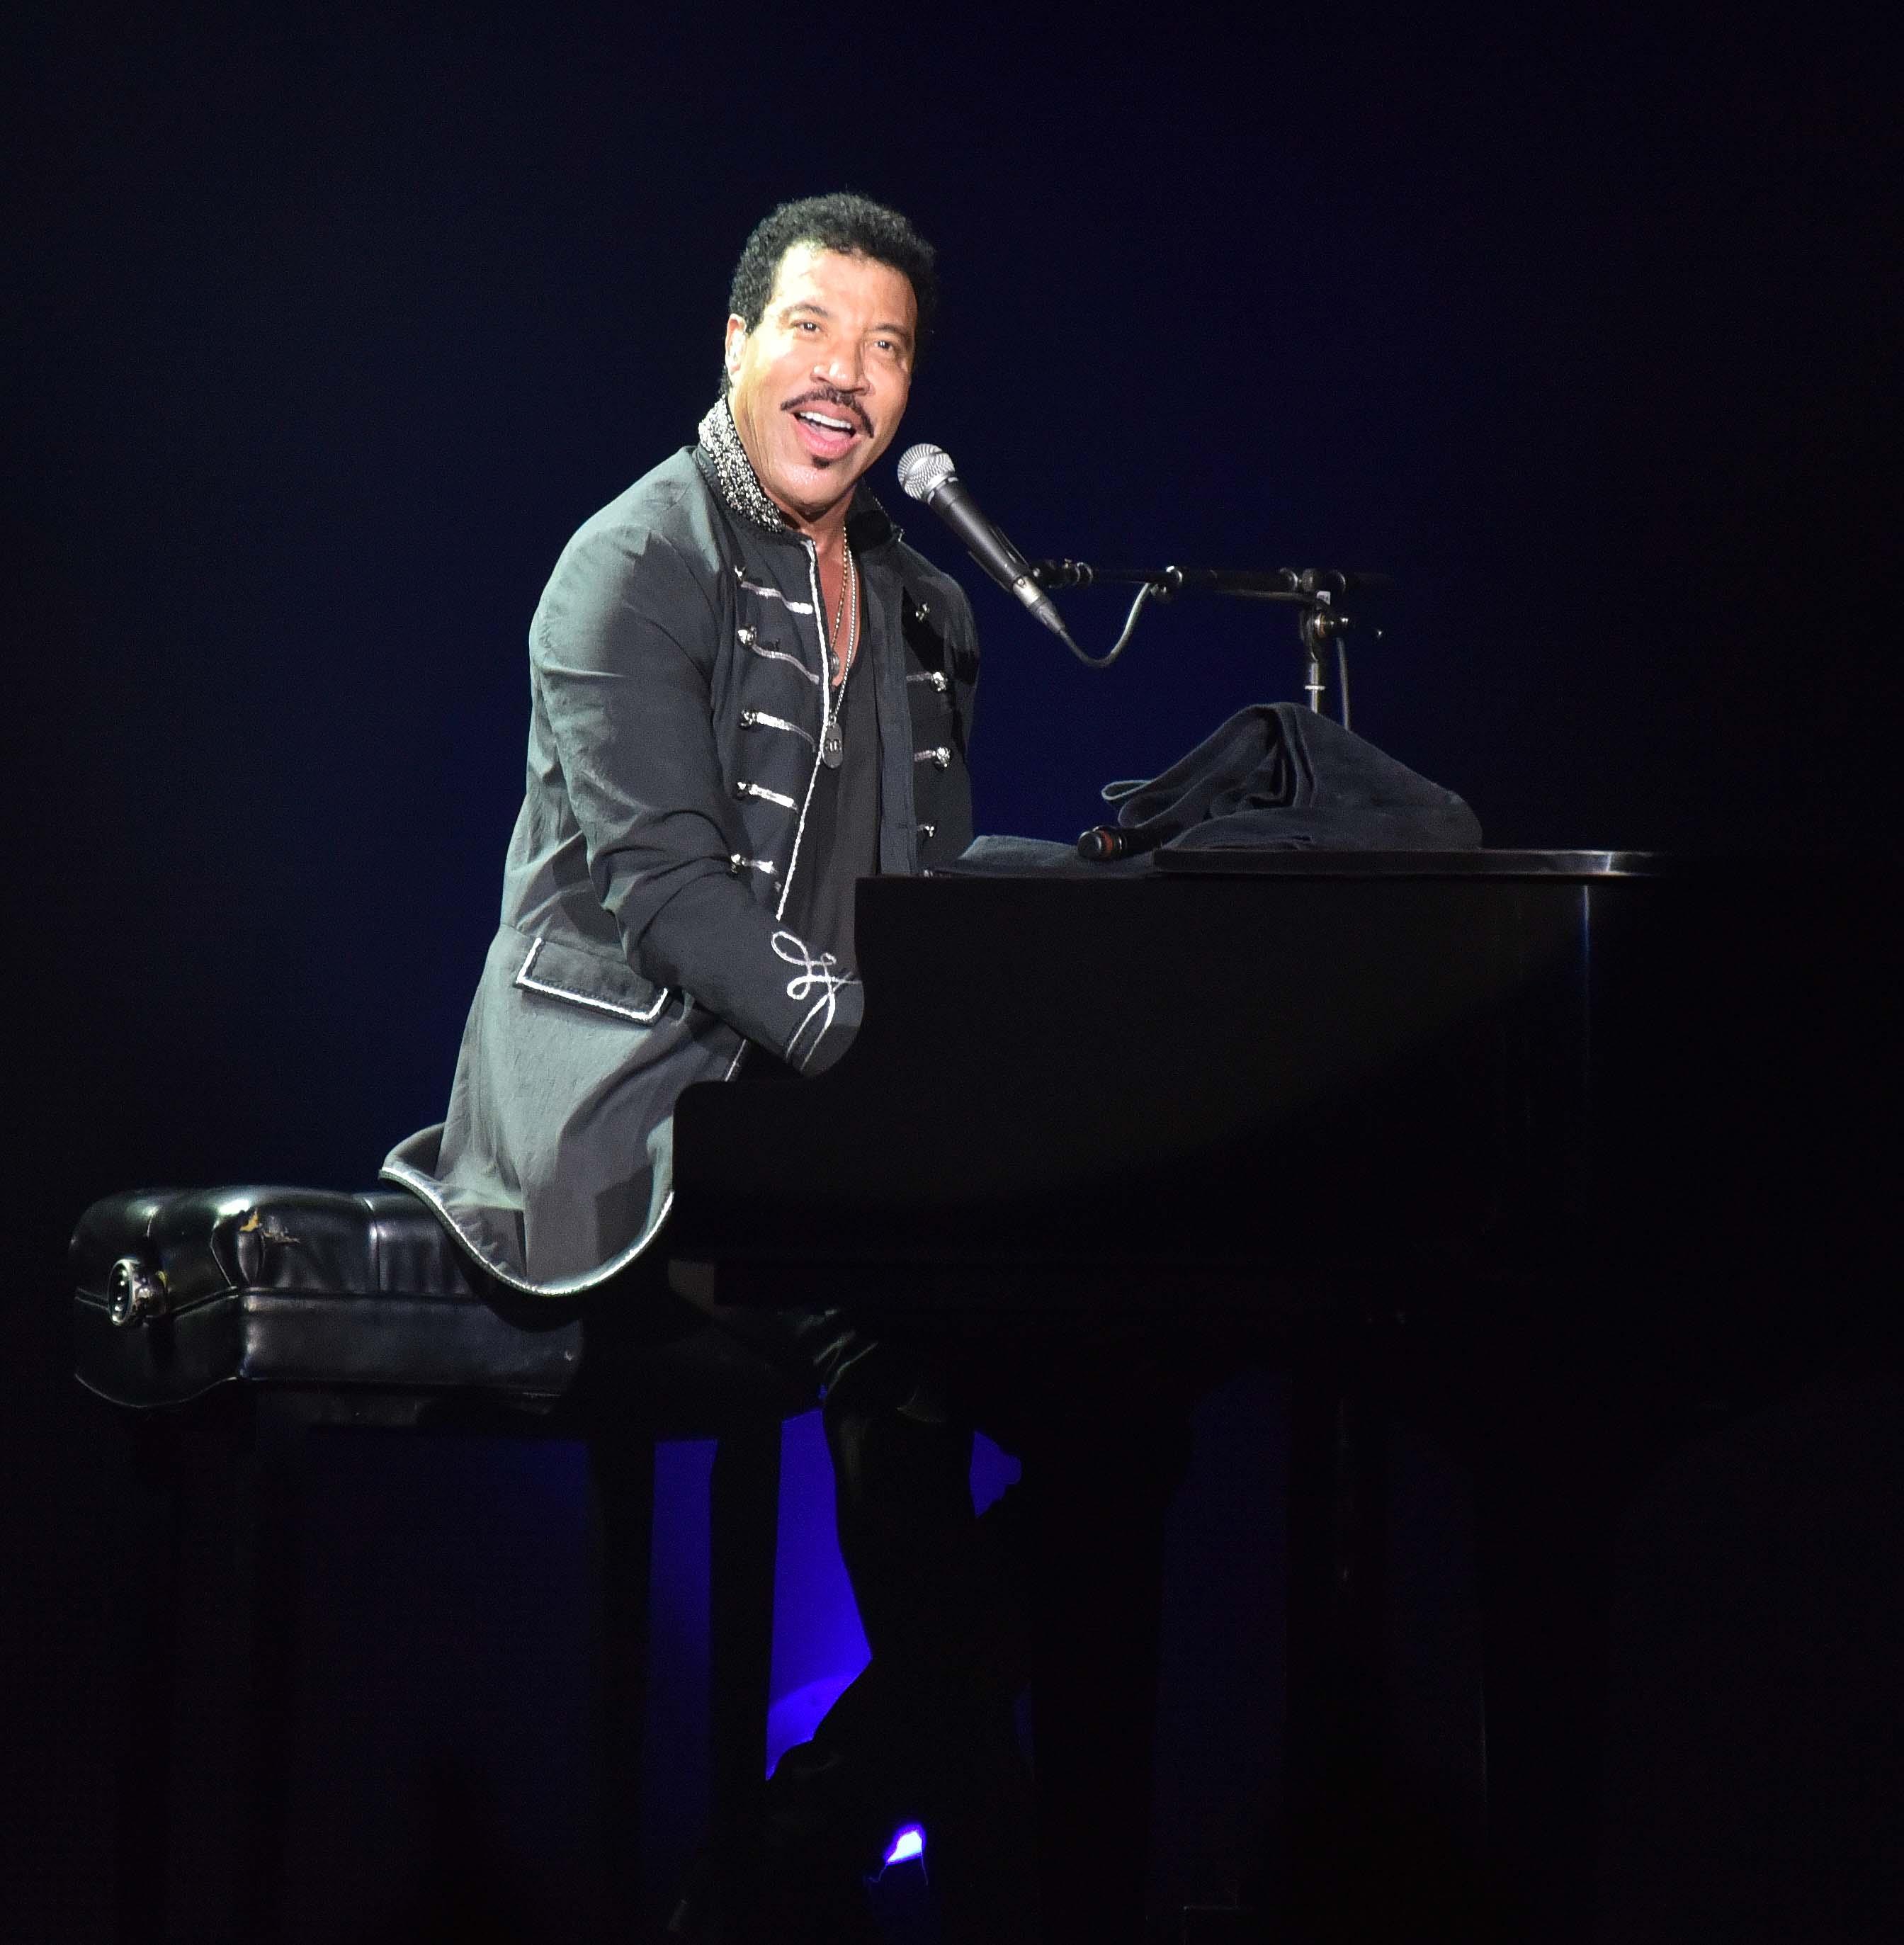 Lionel Ritchie World Tour 2015